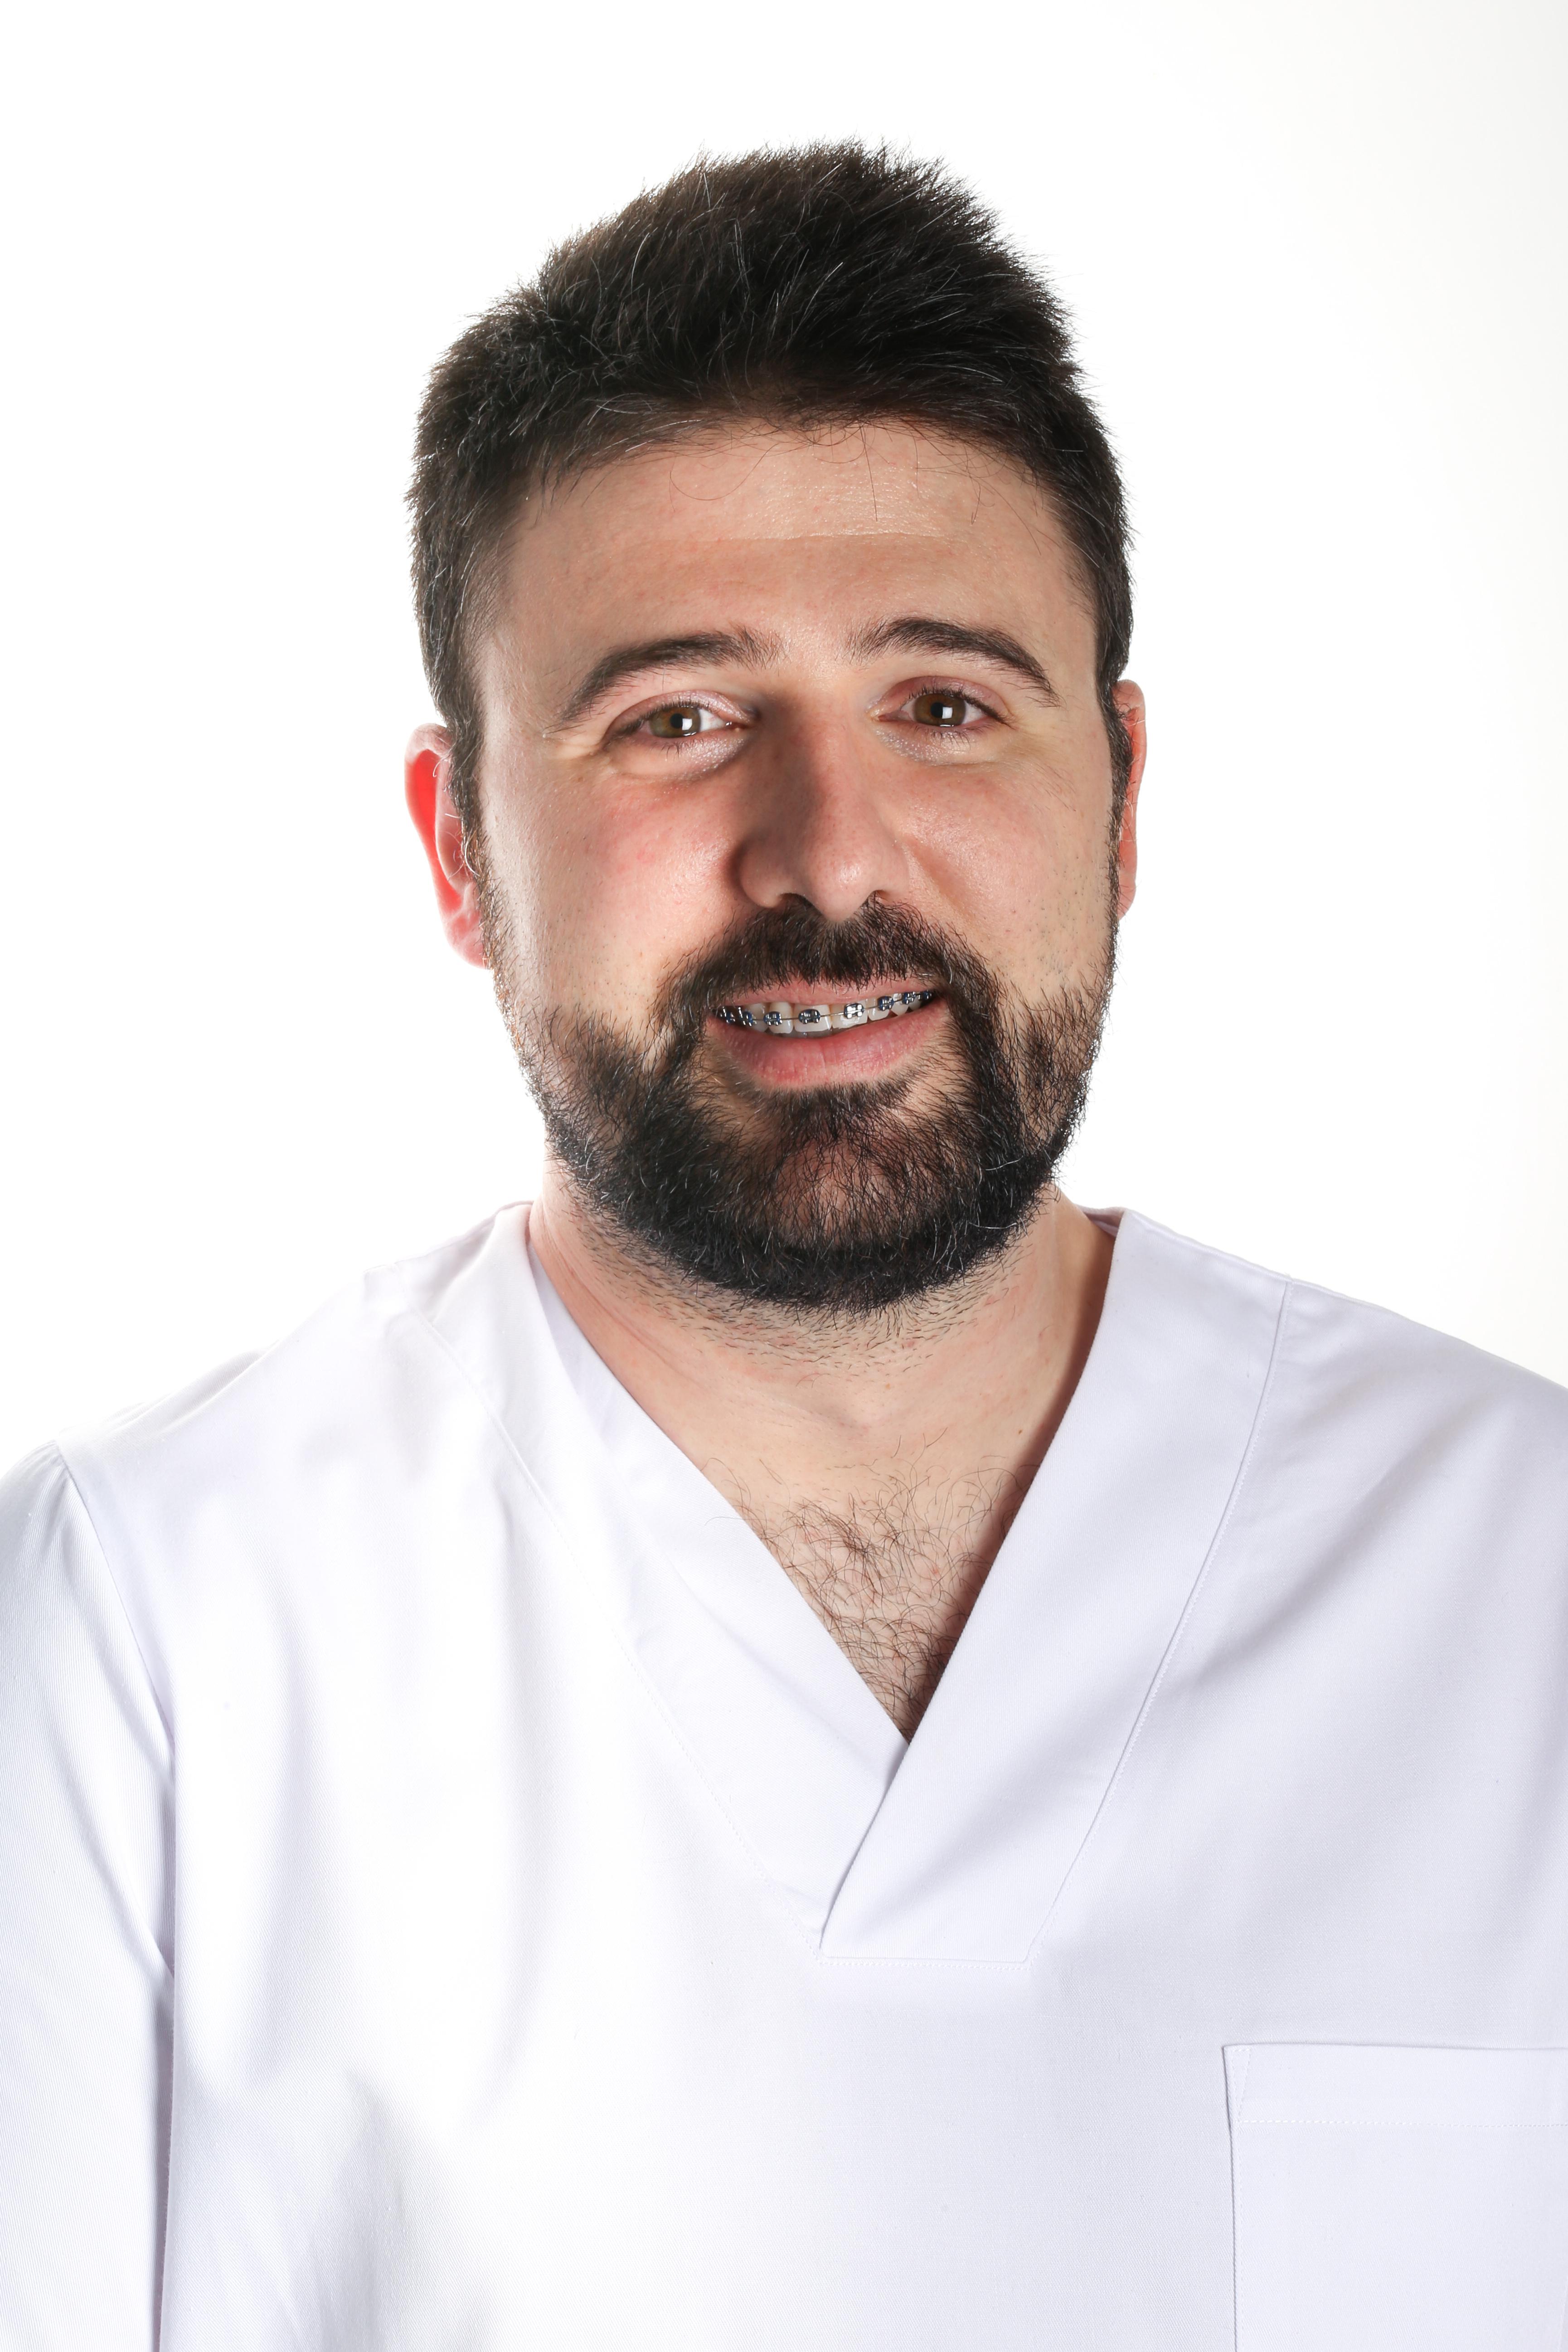 Dr. Gondra